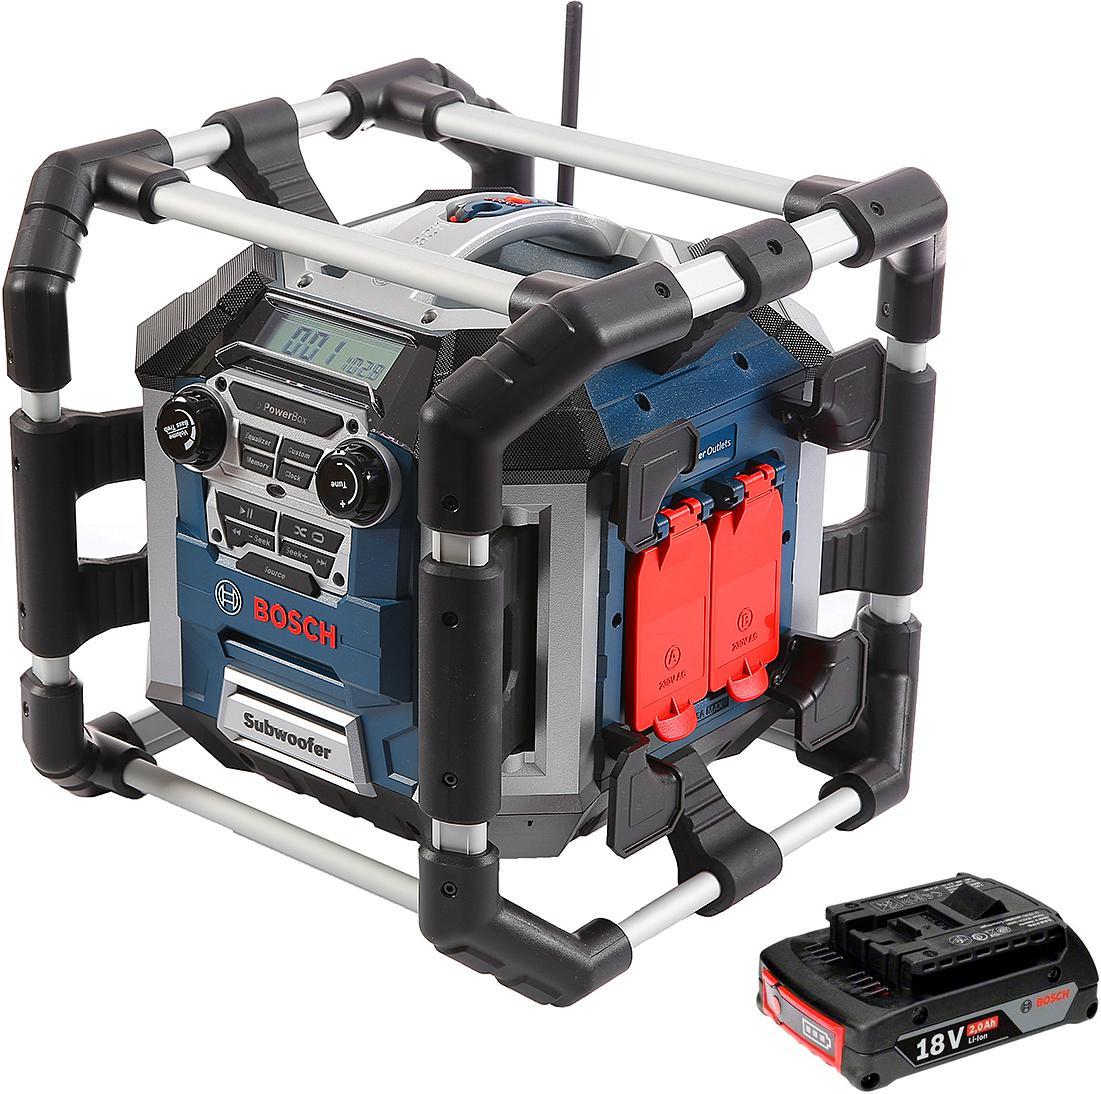 Фото - Набор Bosch Радио gml 50 power box (0.601.429.600) +Аккумулятор 1600z00036 аккумулятор